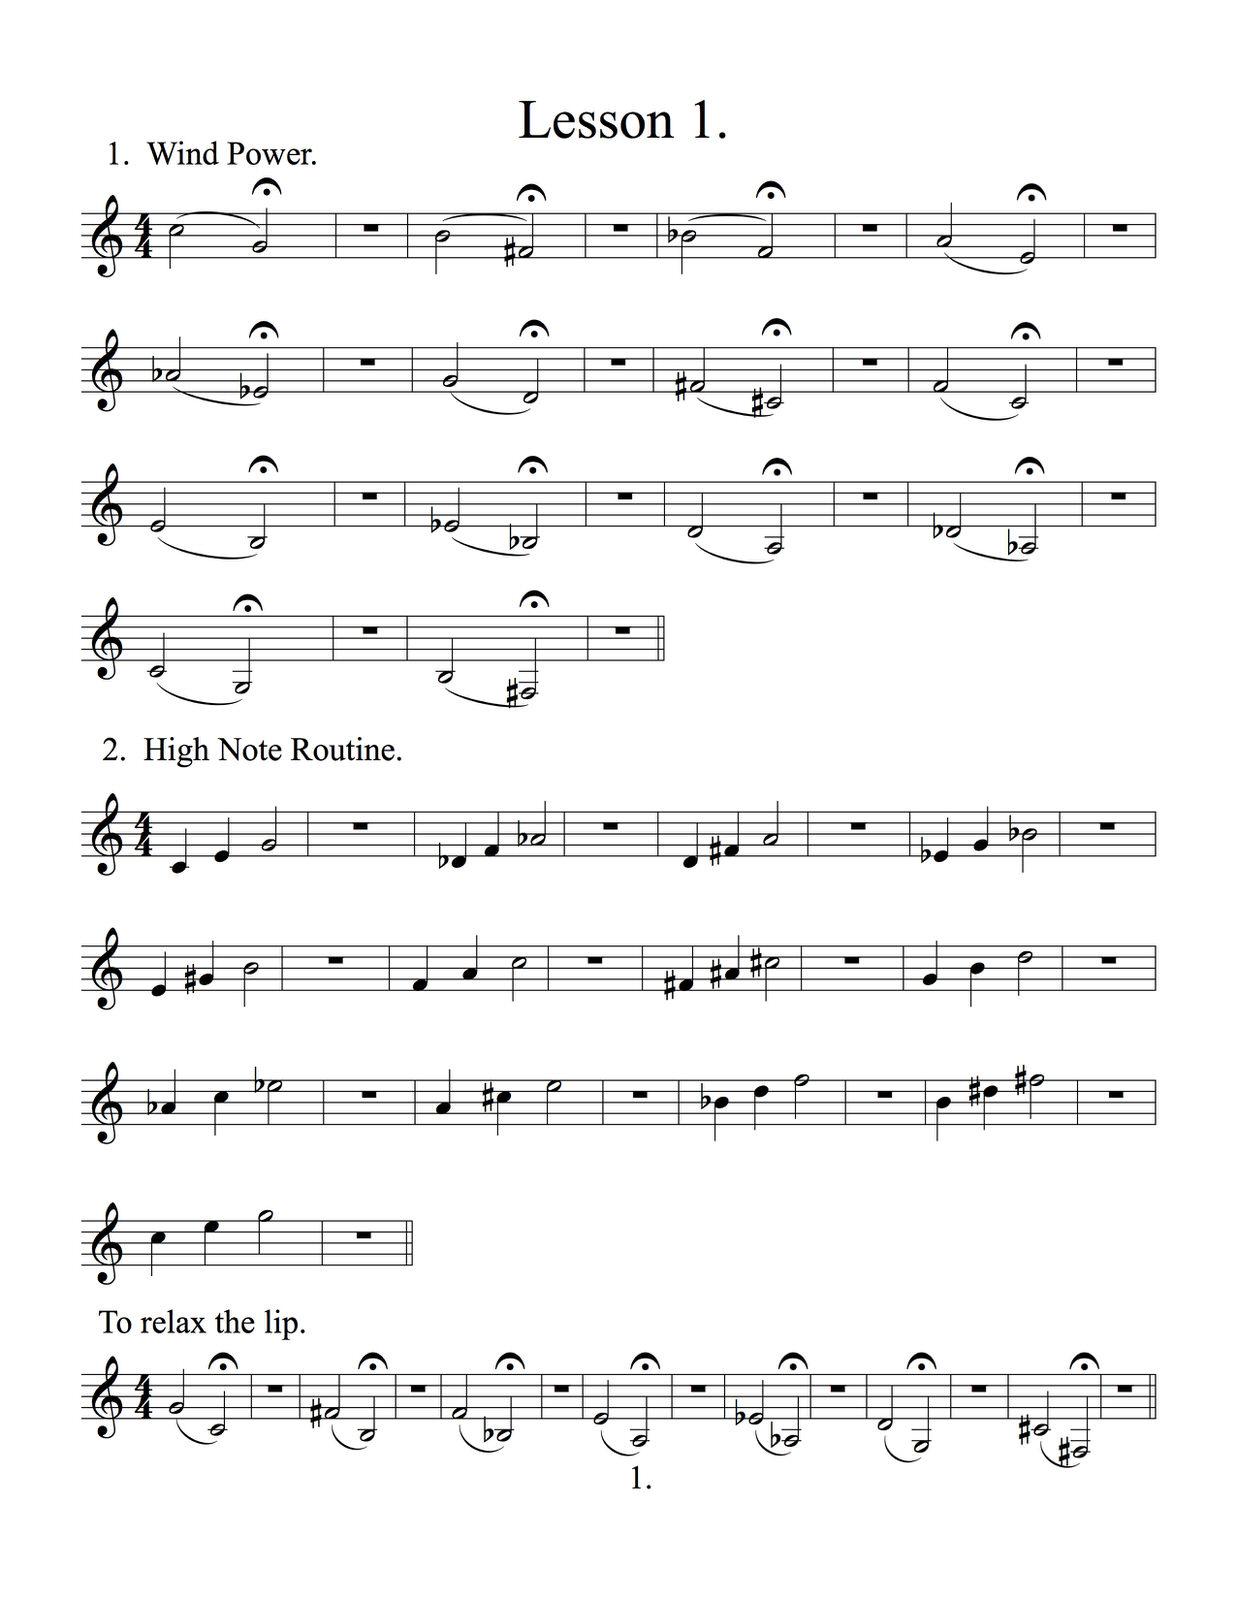 knevitt-developing-trumpet-player-3